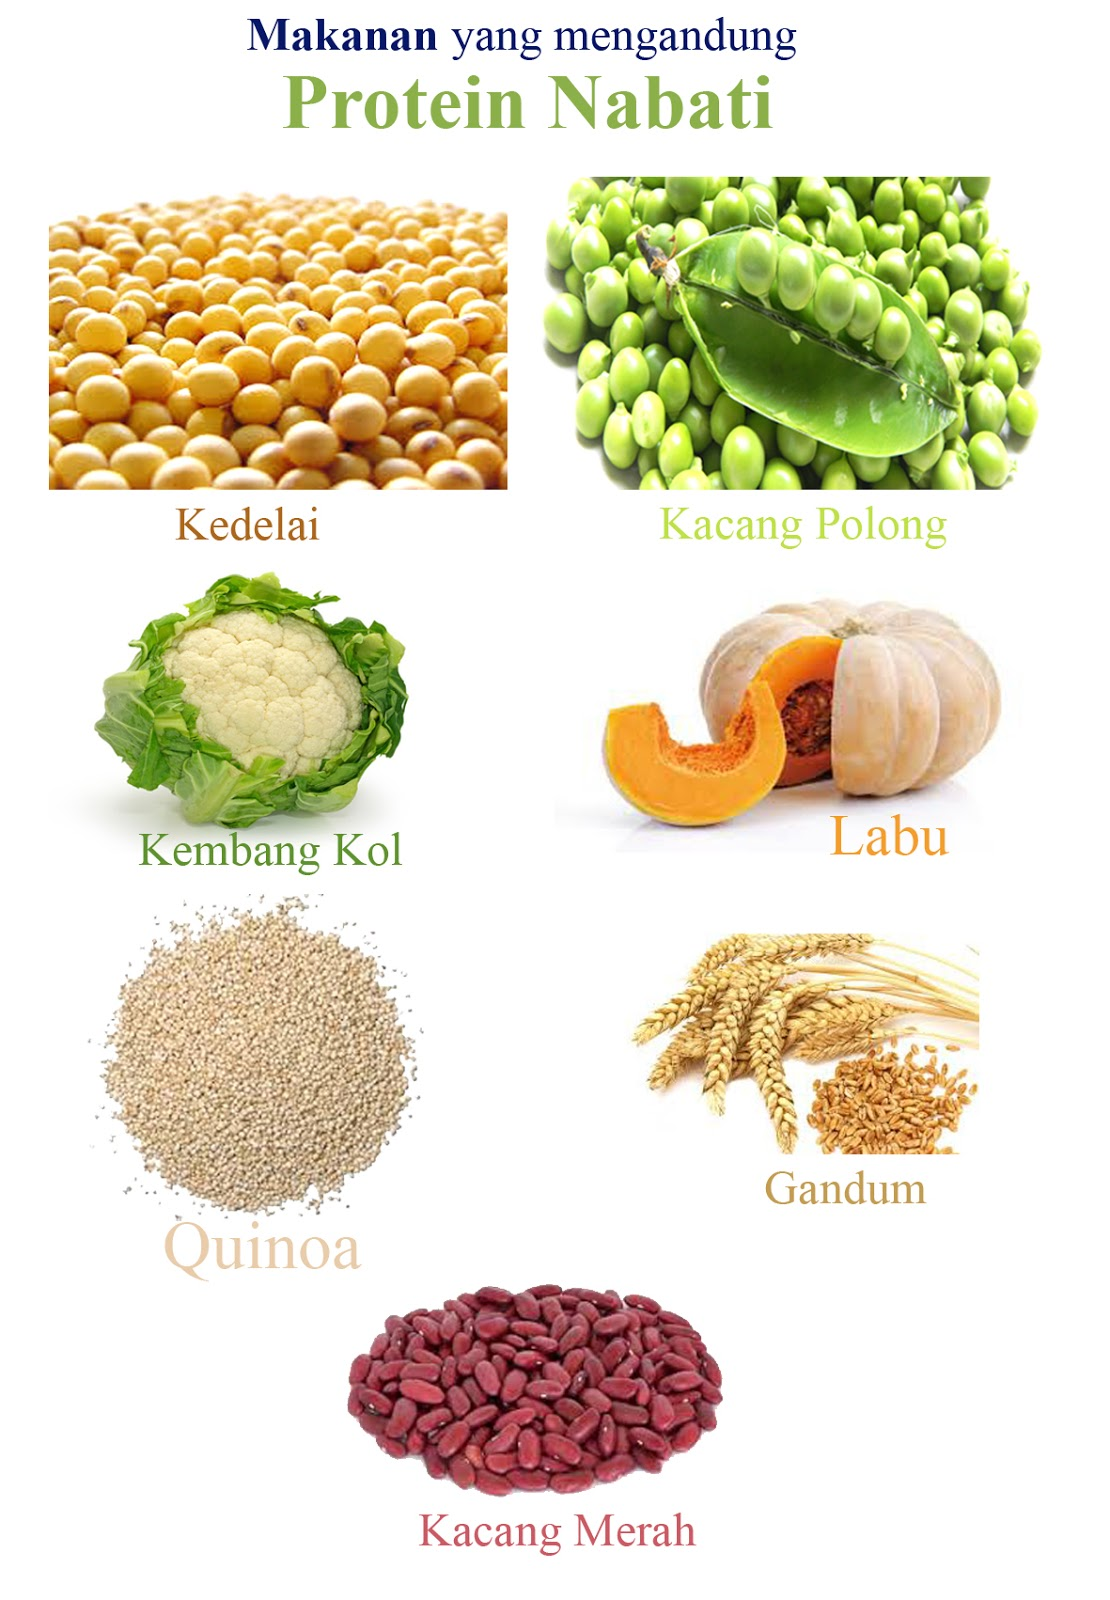 Makanan Yang Mengandung Protein Nabati Tugas Sekolah Ku